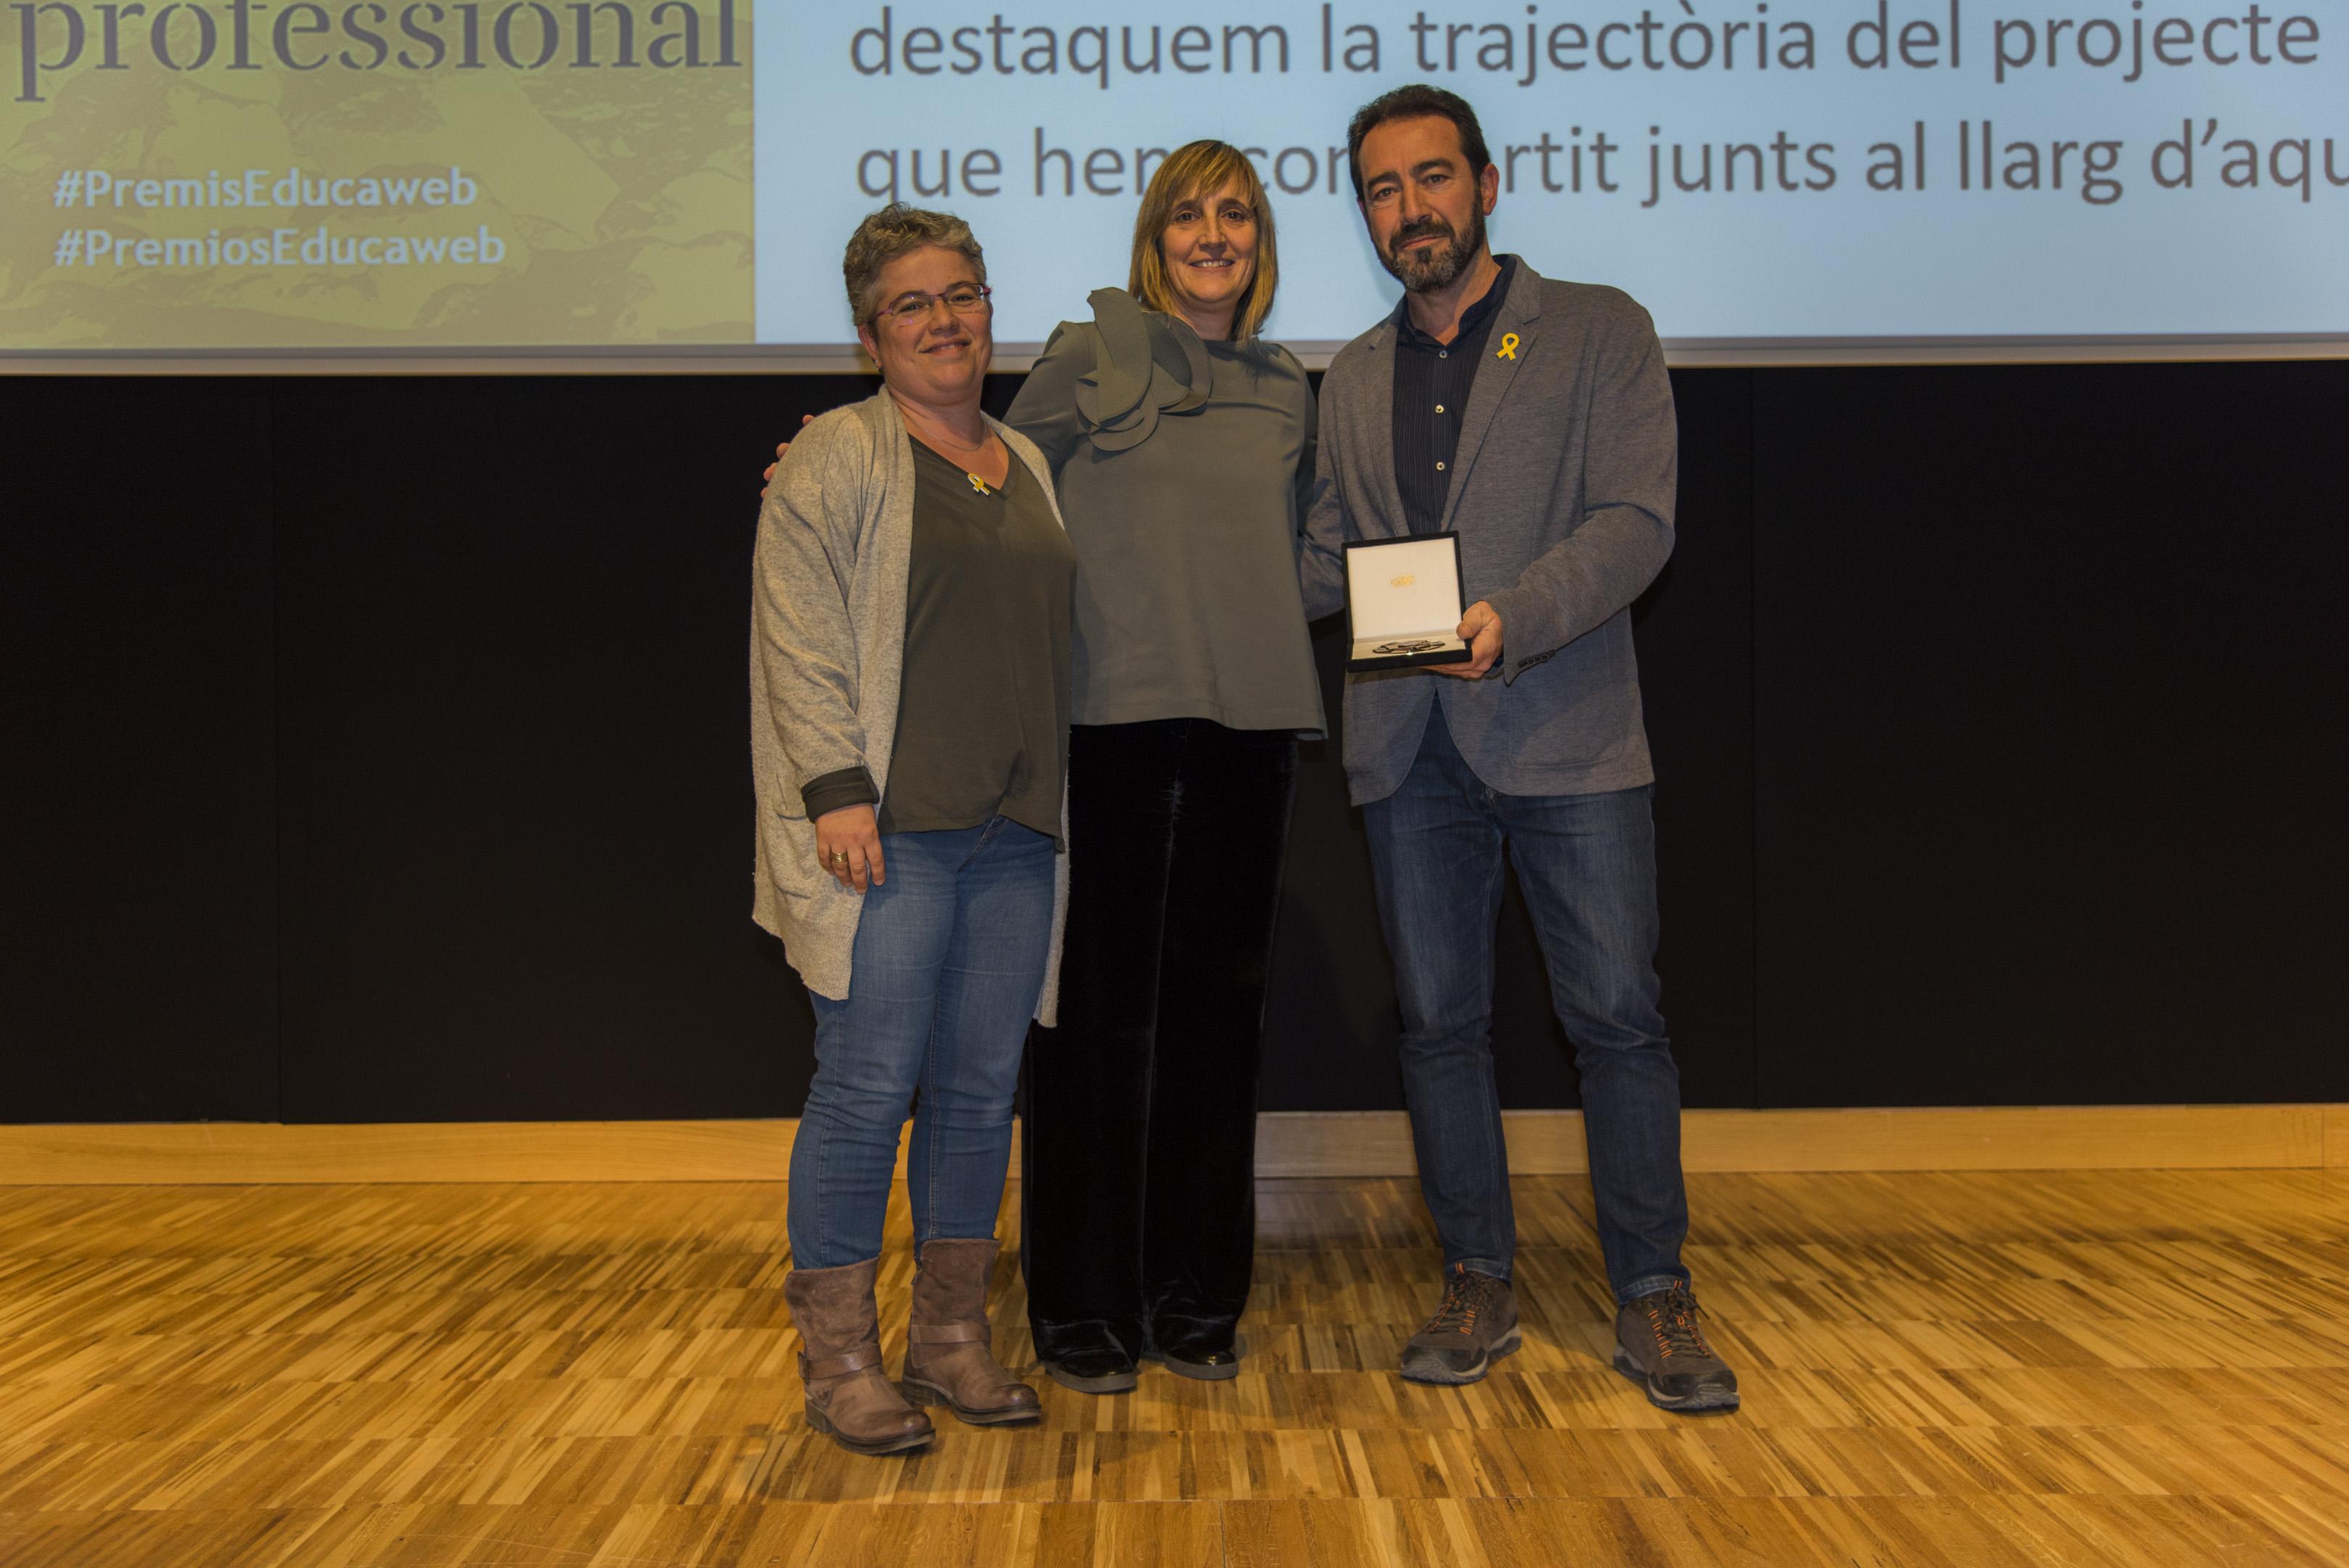 Consell Comarcal del Vallès Oriental